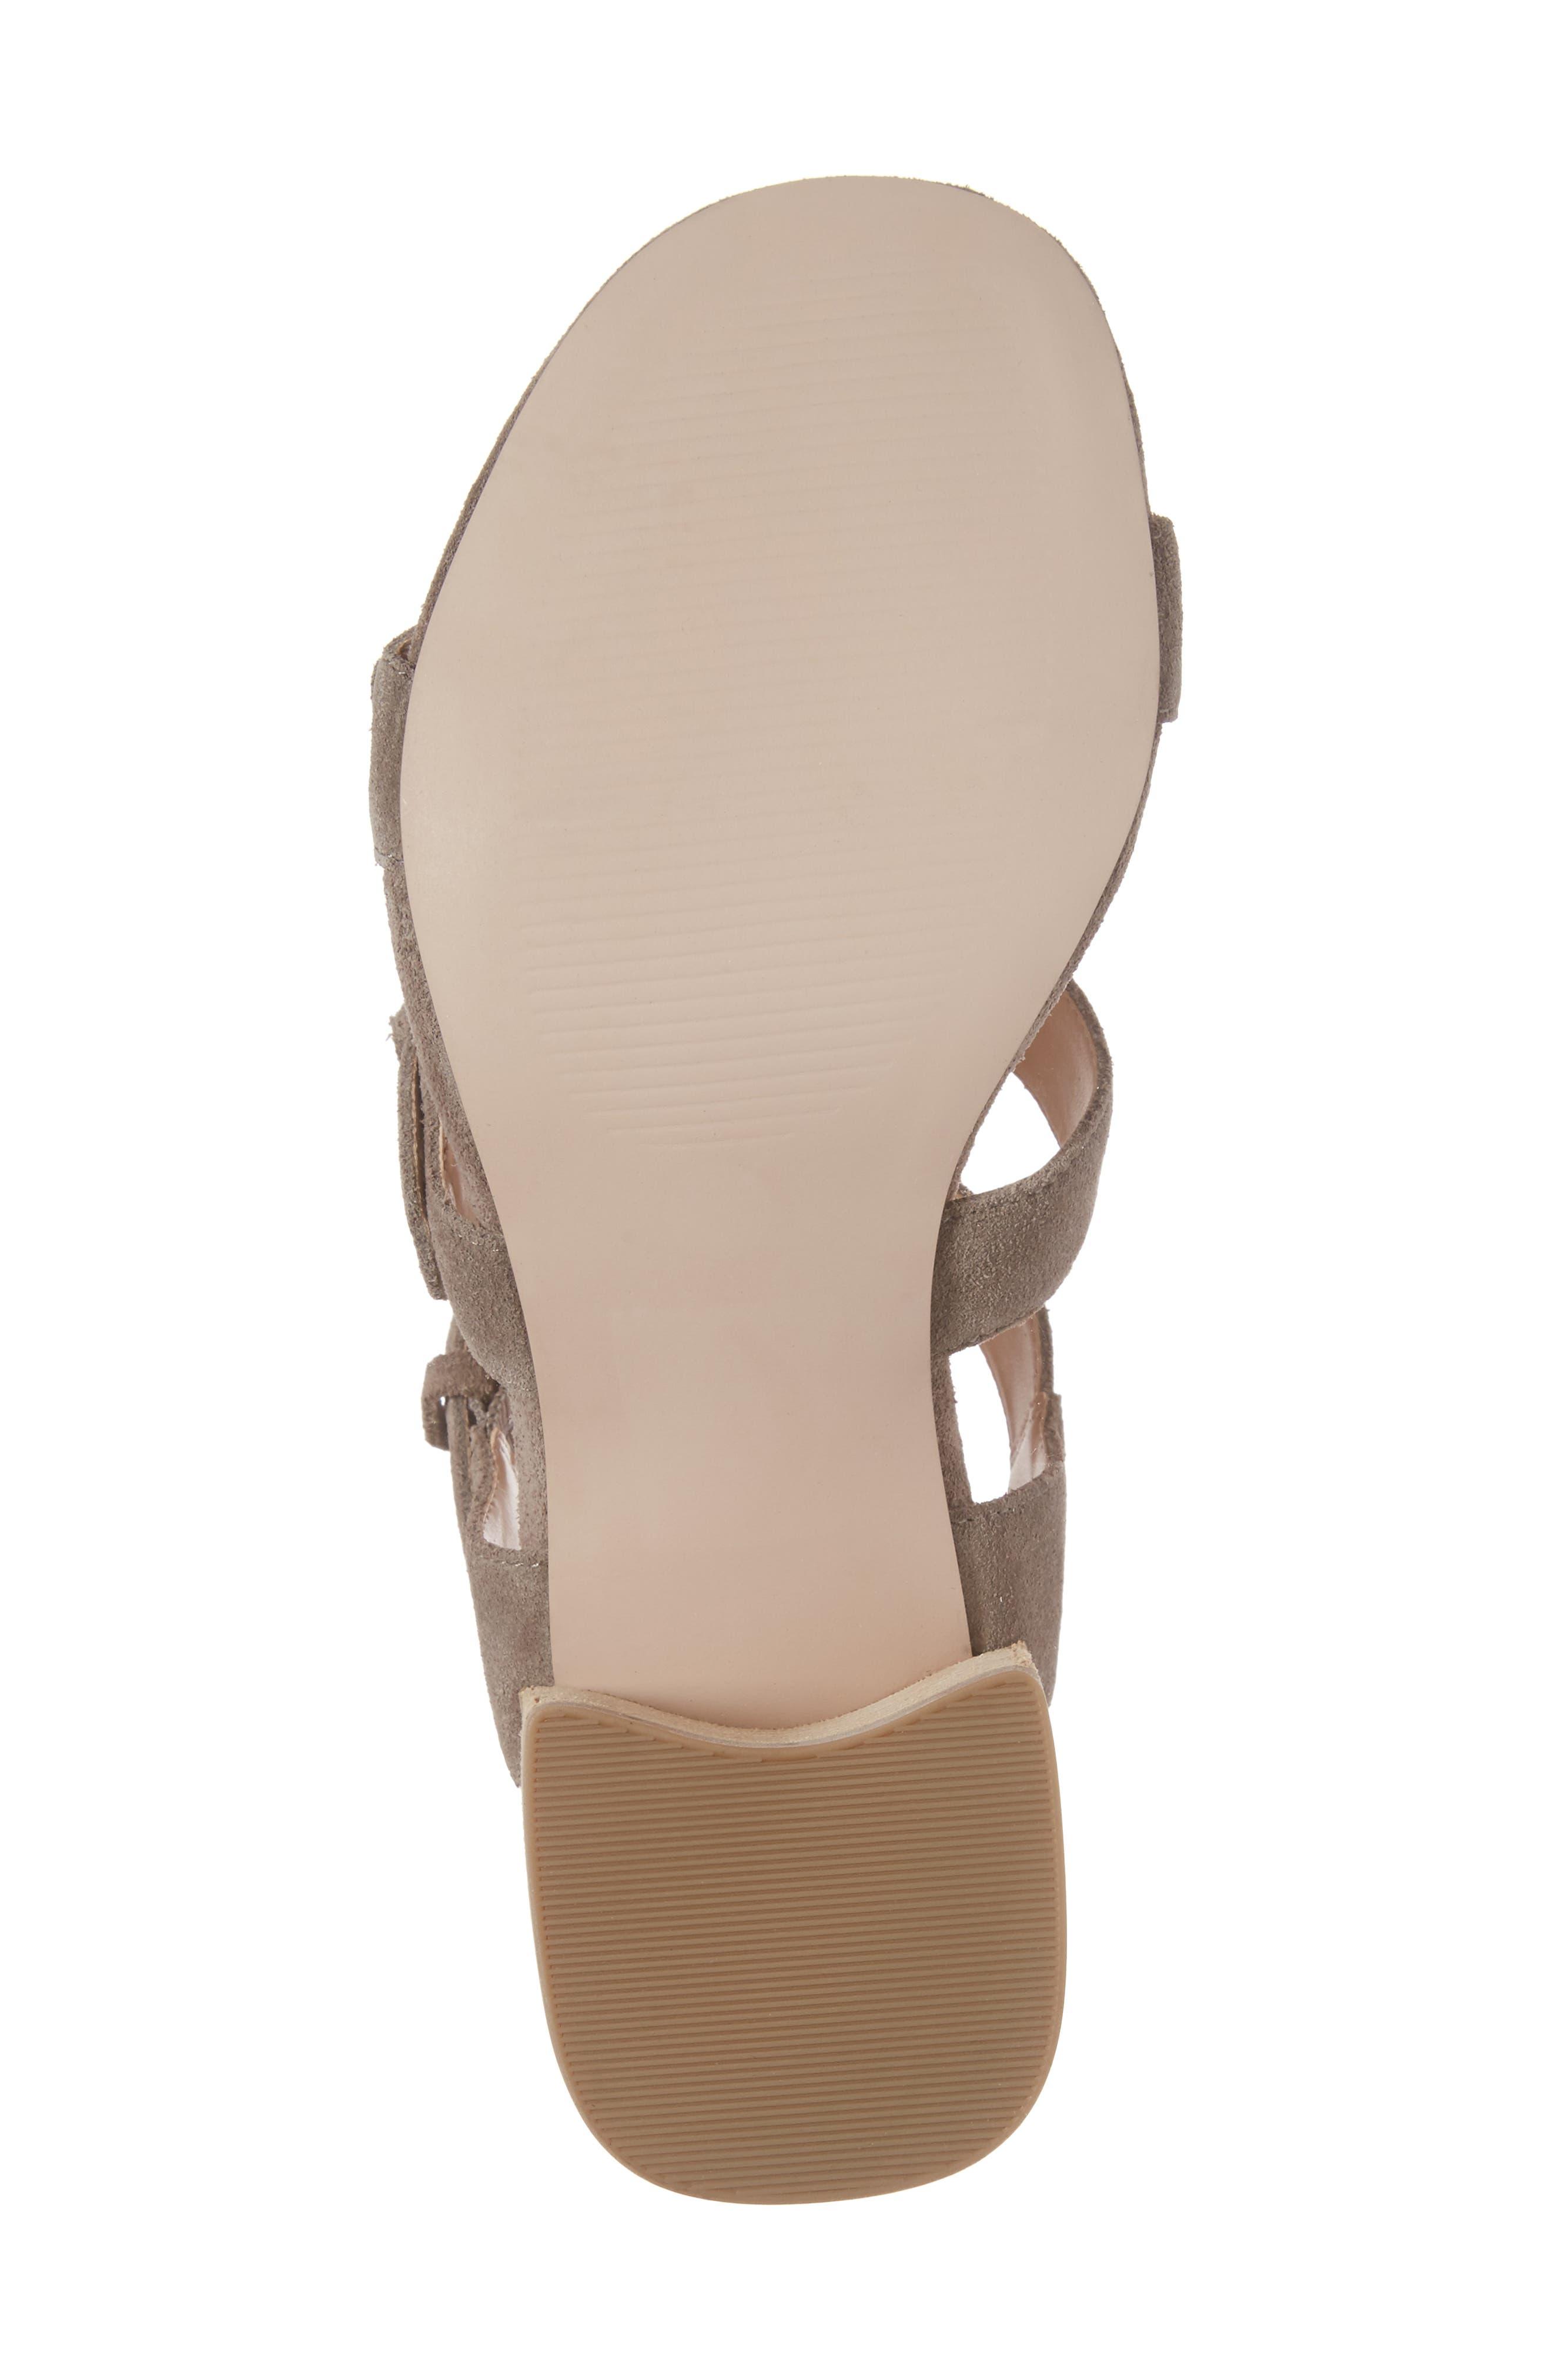 Culver Block Heel Sandal,                             Alternate thumbnail 6, color,                             MUSHROOM SUEDE